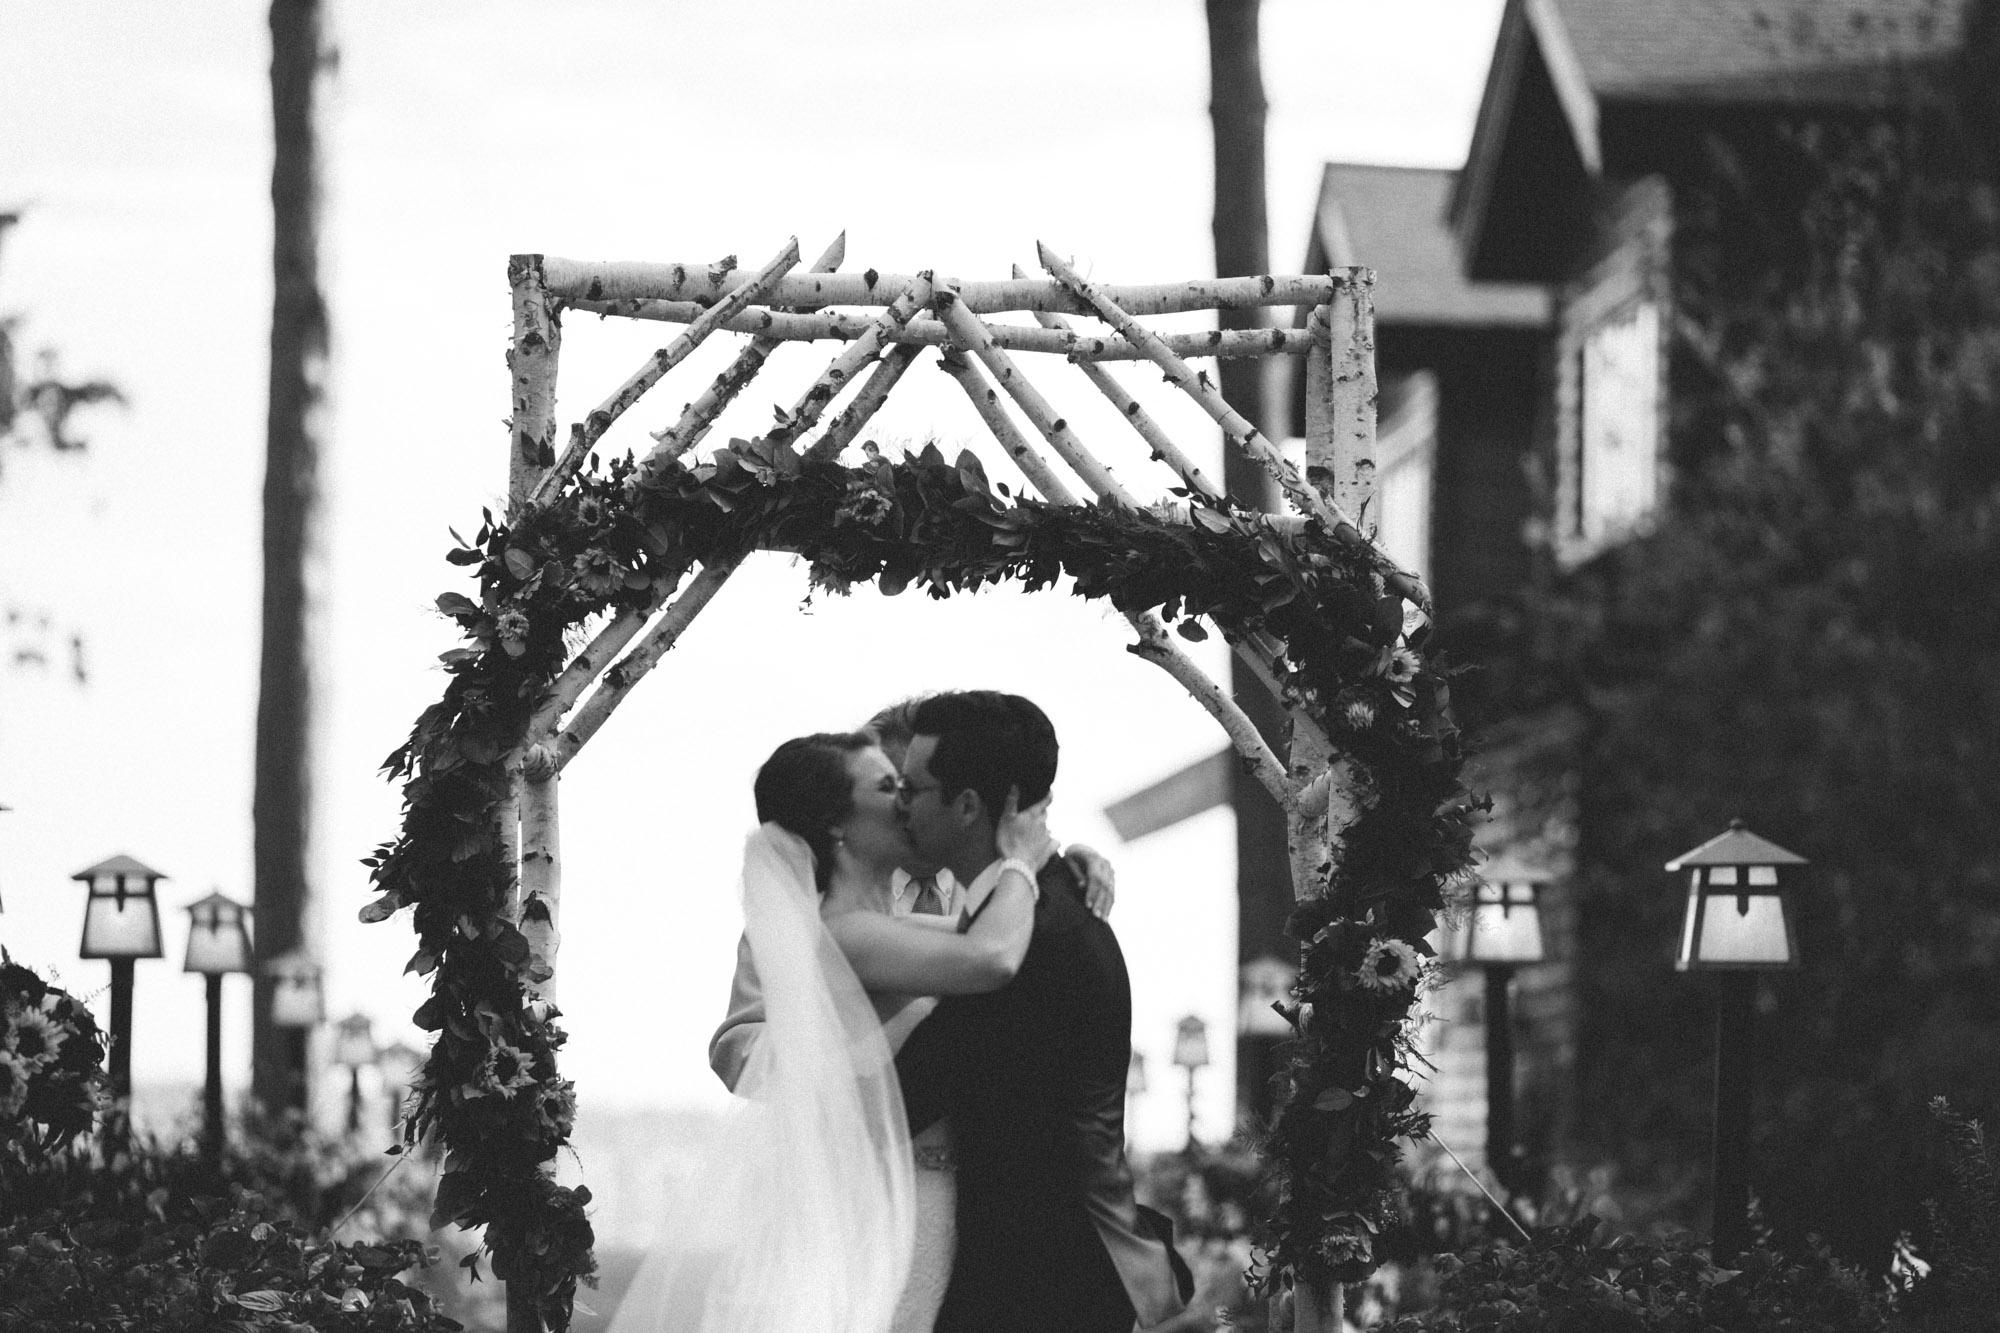 First kiss during wedding ceremony at Grand View Lodge. Photography by Britt DeZeeuw, Brainerd Minnesota artistic photographer